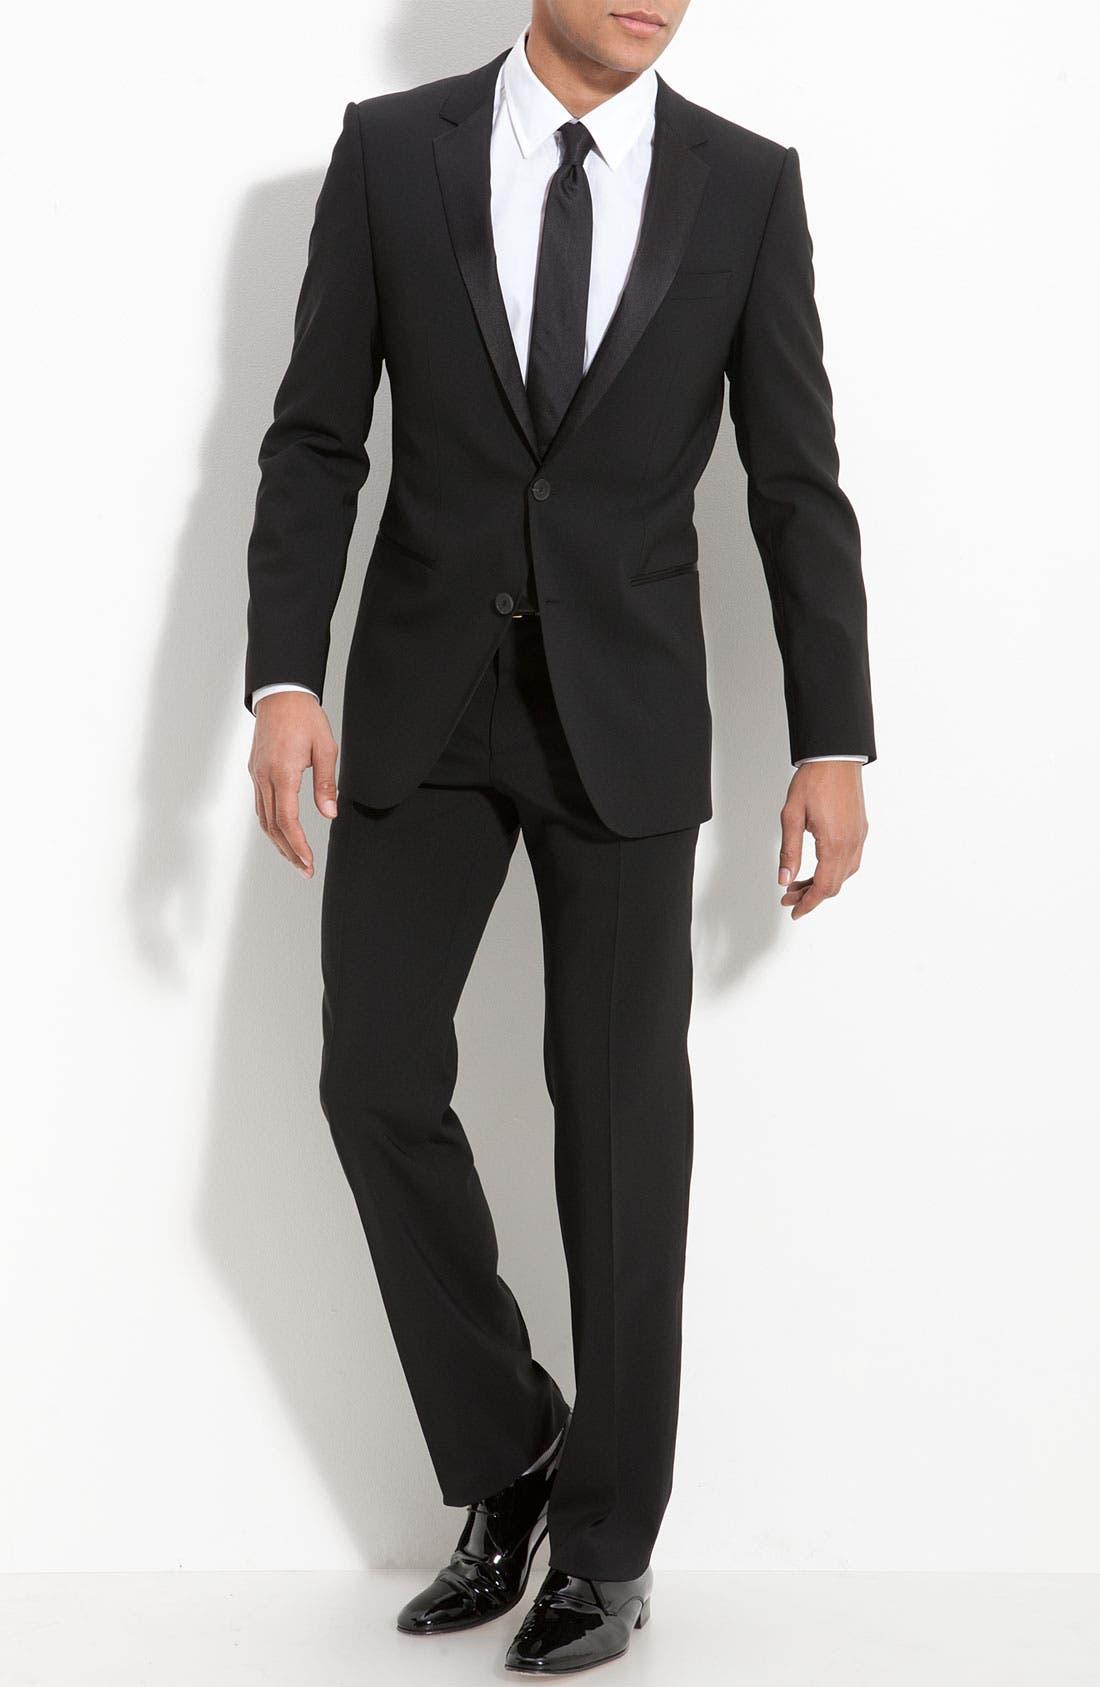 Main Image - HUGO 'Aikin Hollo' Trim Fit Wool Tuxedo